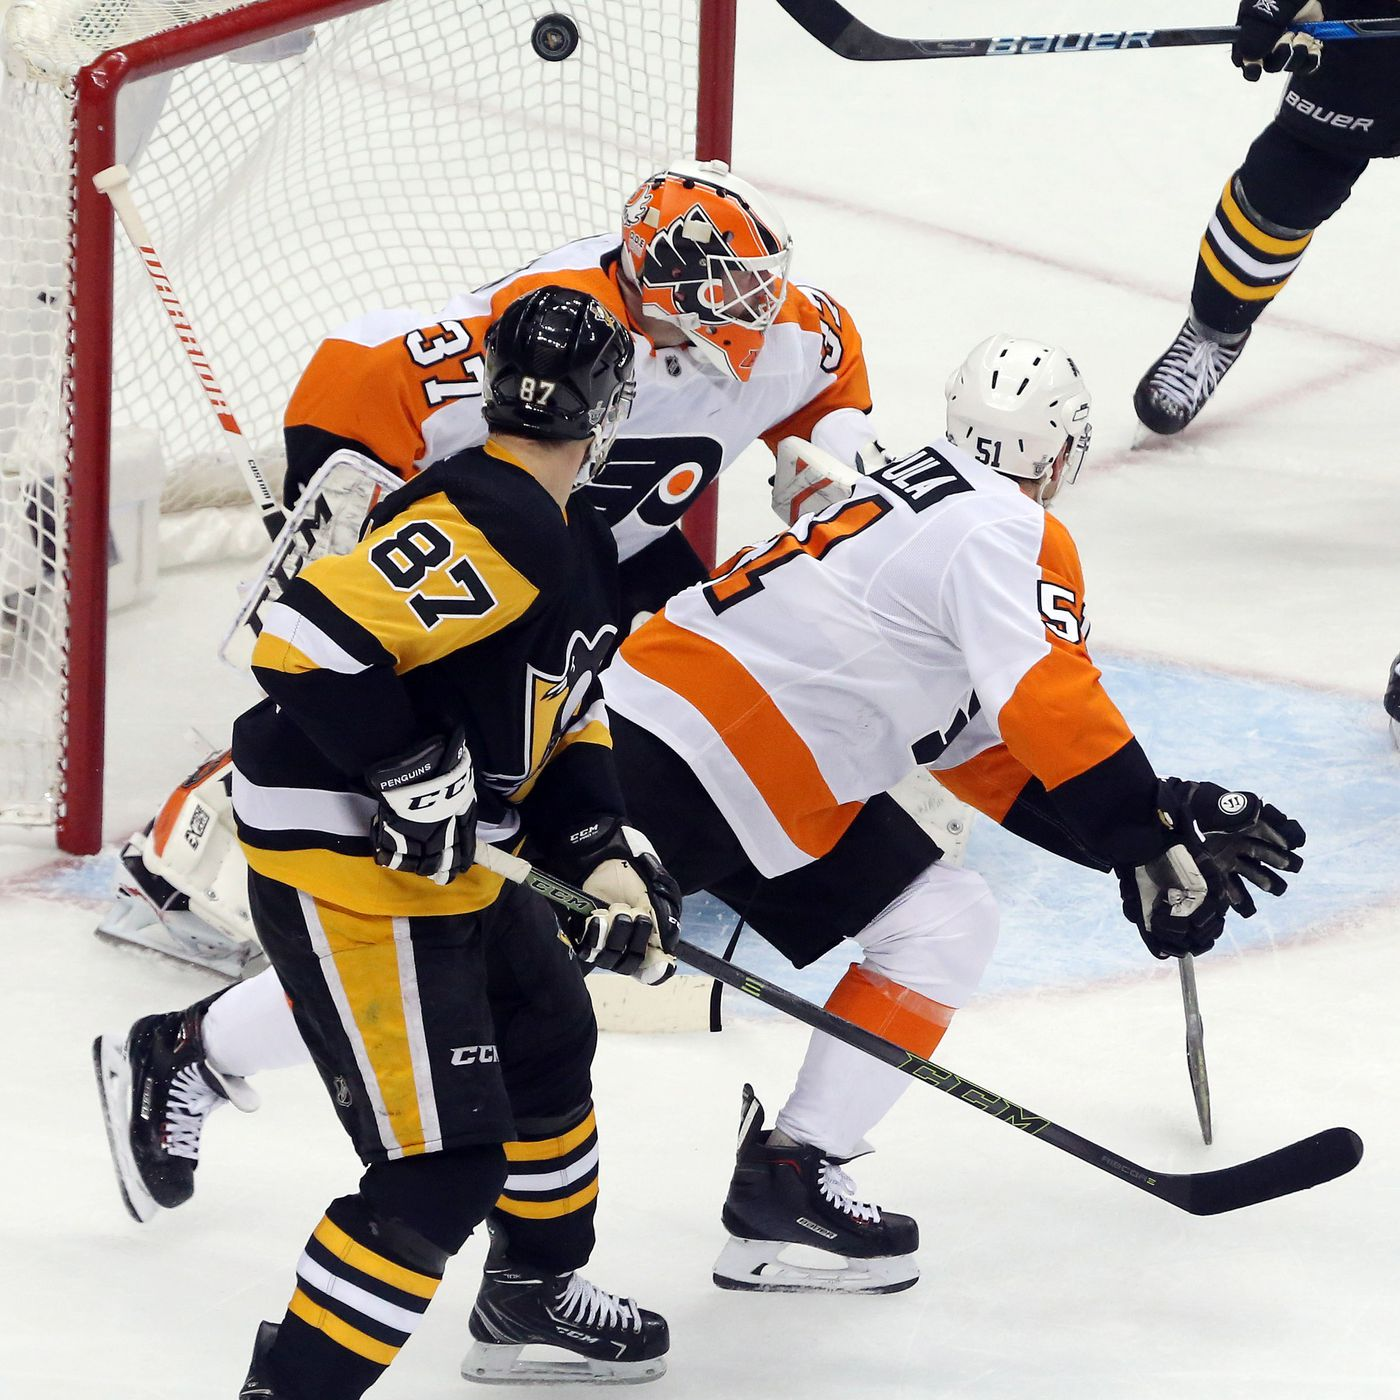 a59fdecda96 Sidney Crosby s latest highlight goal keys hat trick   Penguins rout of  Flyers